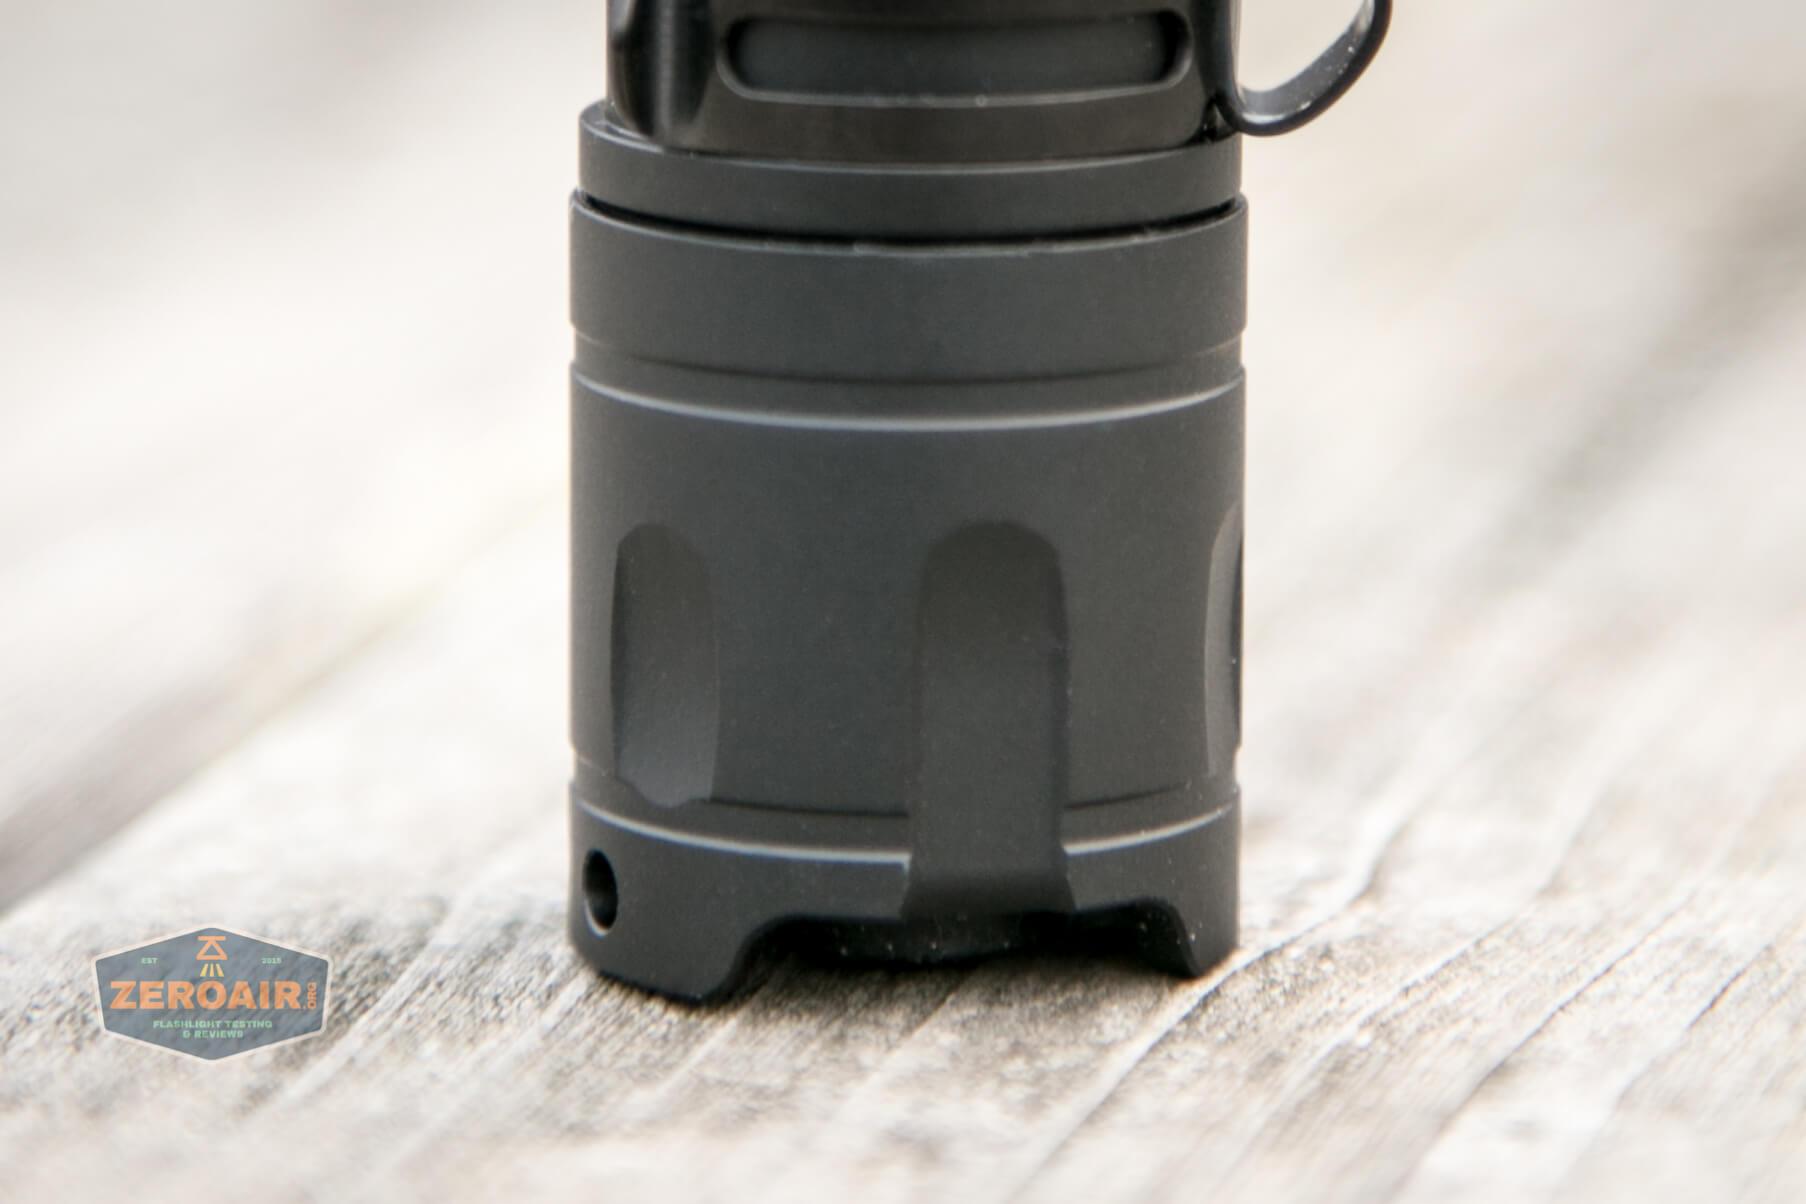 Cyansky P25 Flashlight top down tailcap